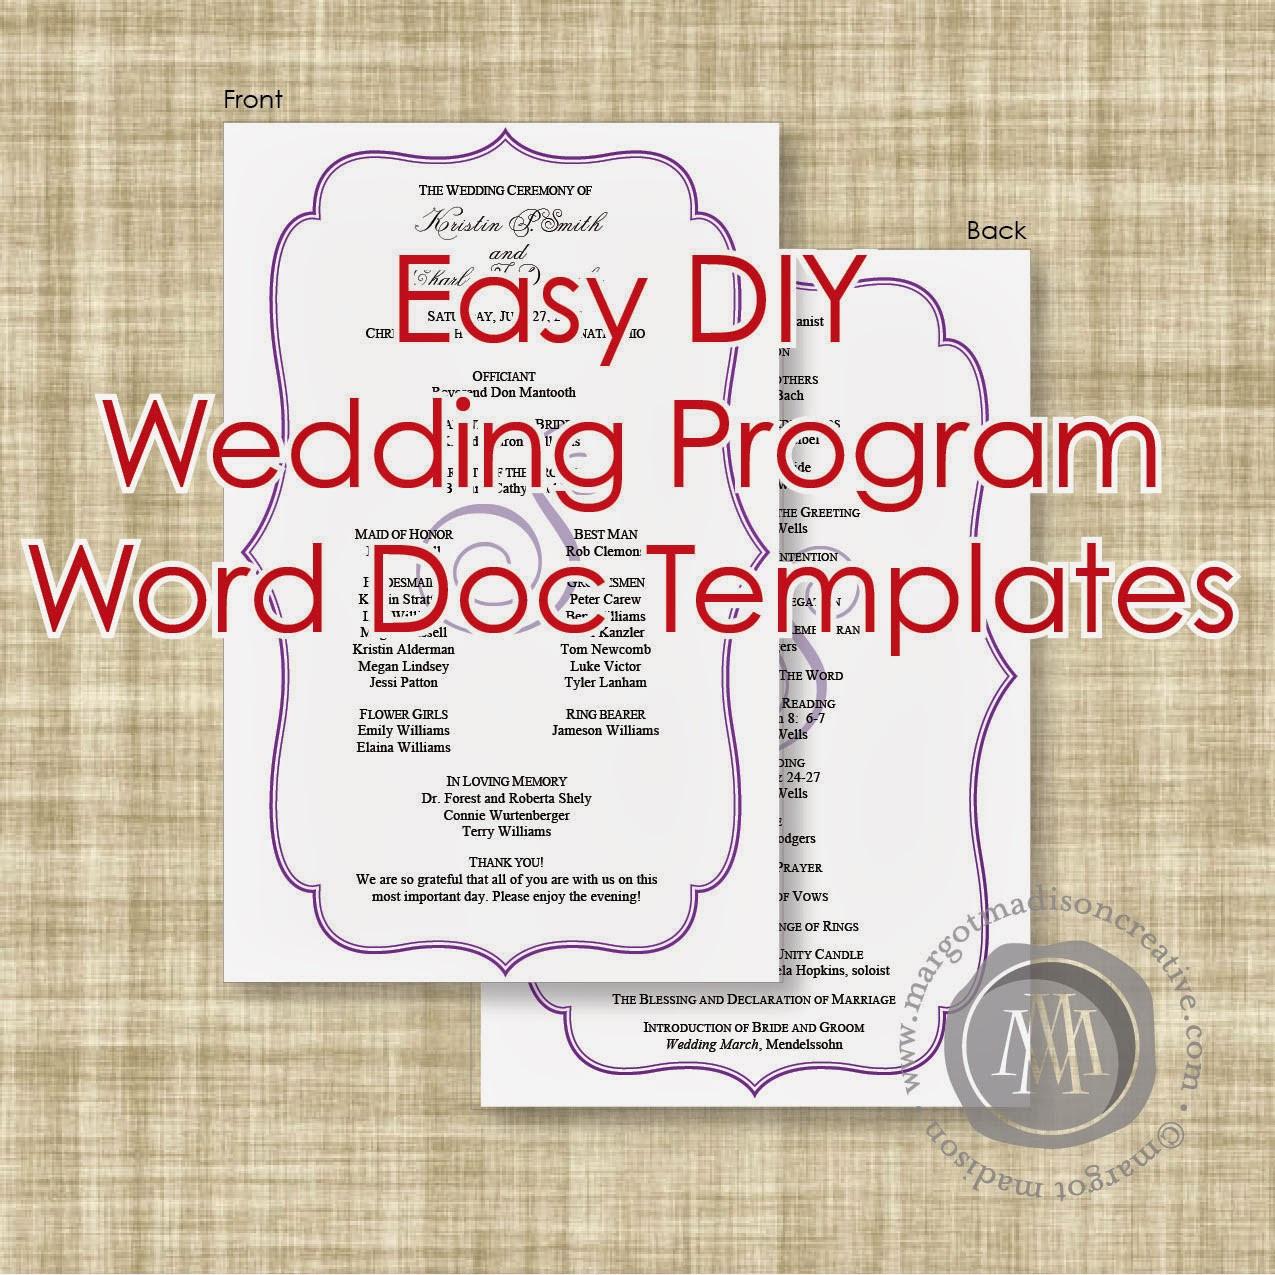 Best ideas about DIY Wedding Program Templates . Save or Pin MargotMadison DIY Wedding Program Word Doc Templates now Now.